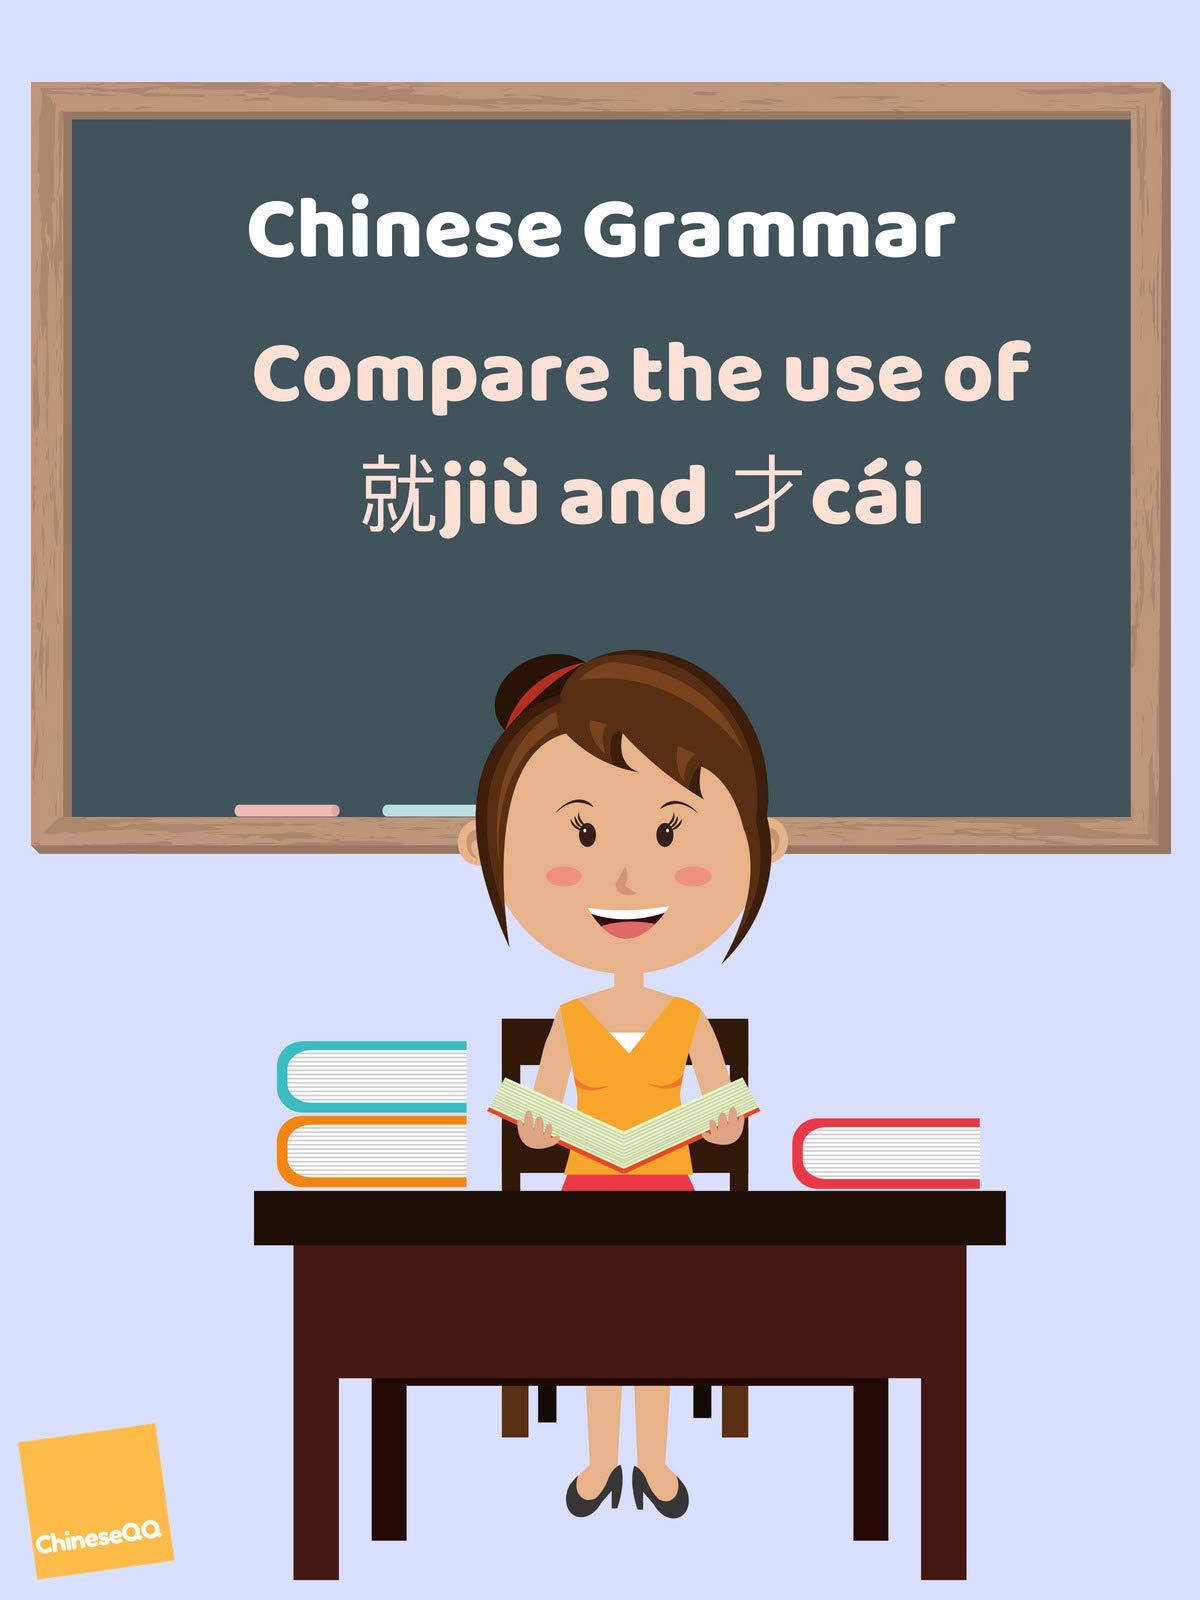 Chinese grammar comparing use of jiu and cai